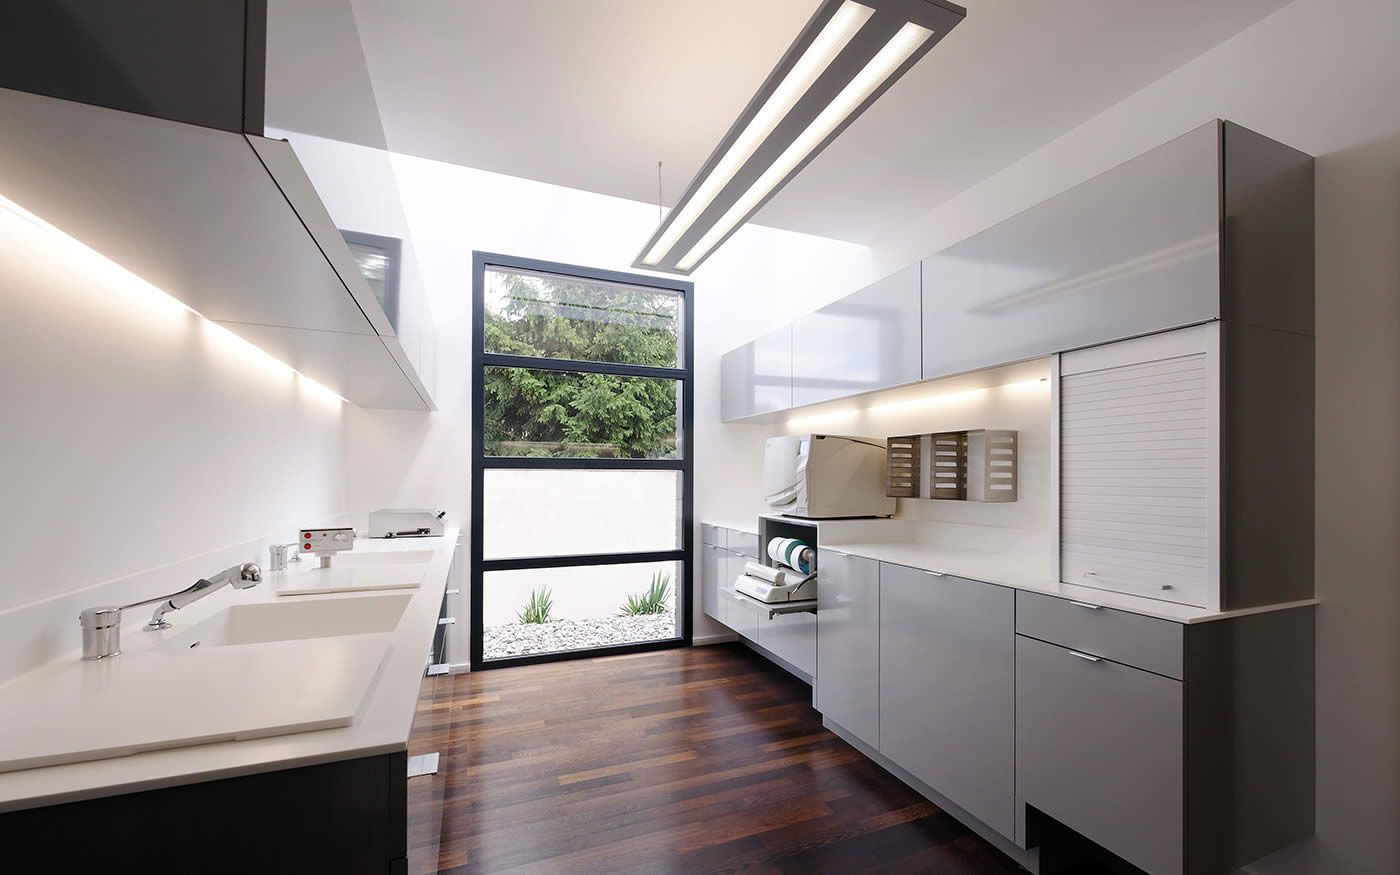 Picture 221 Cabinet Dentaire Design Gregoire Ruault Inventive